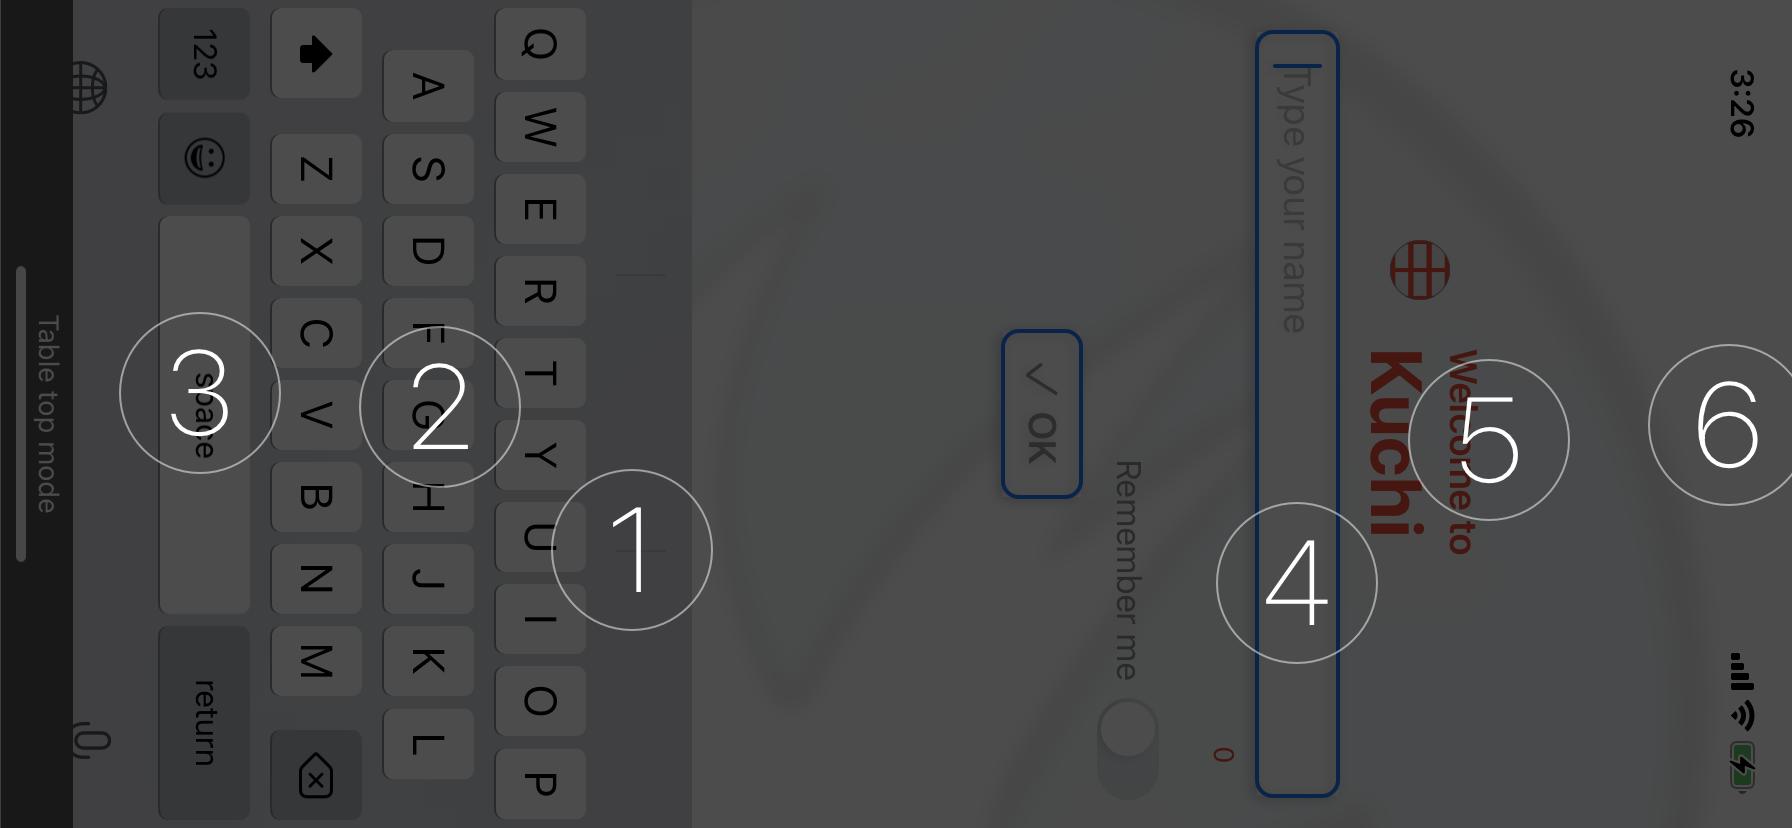 Braille Screen Input